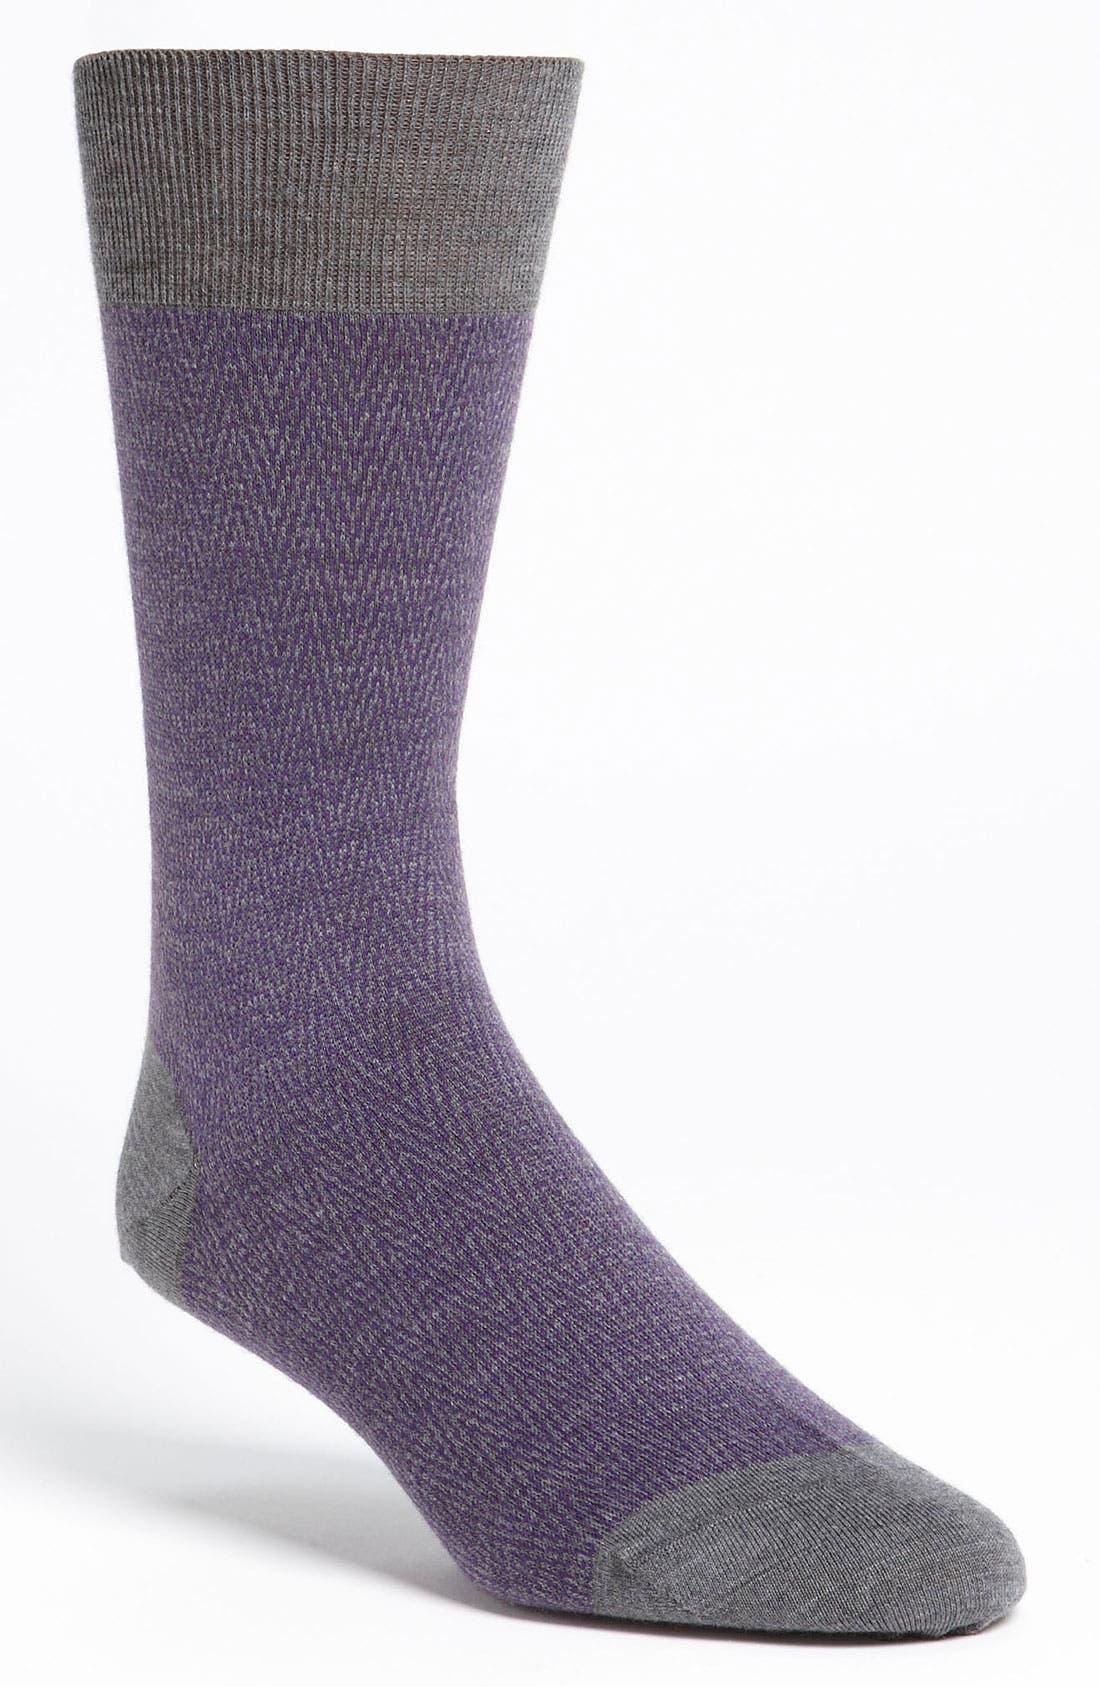 Alternate Image 1 Selected - Ermenegildo Zegna Herringbone Socks